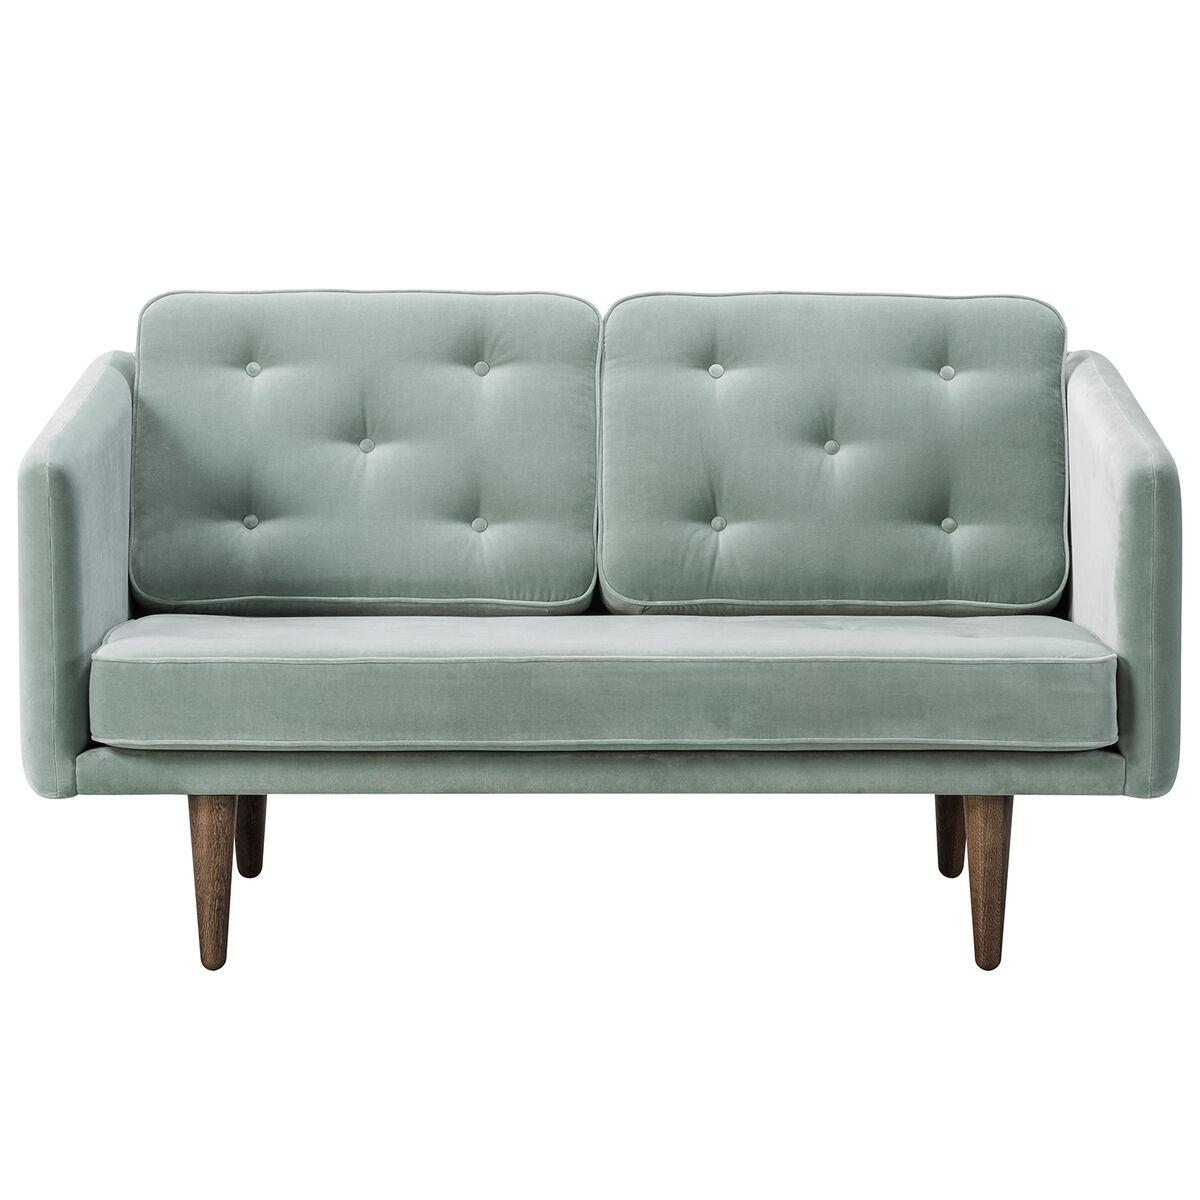 Fredericia No. 1 sohva, 2-istuttava, Harald 823 - savustettu tammi